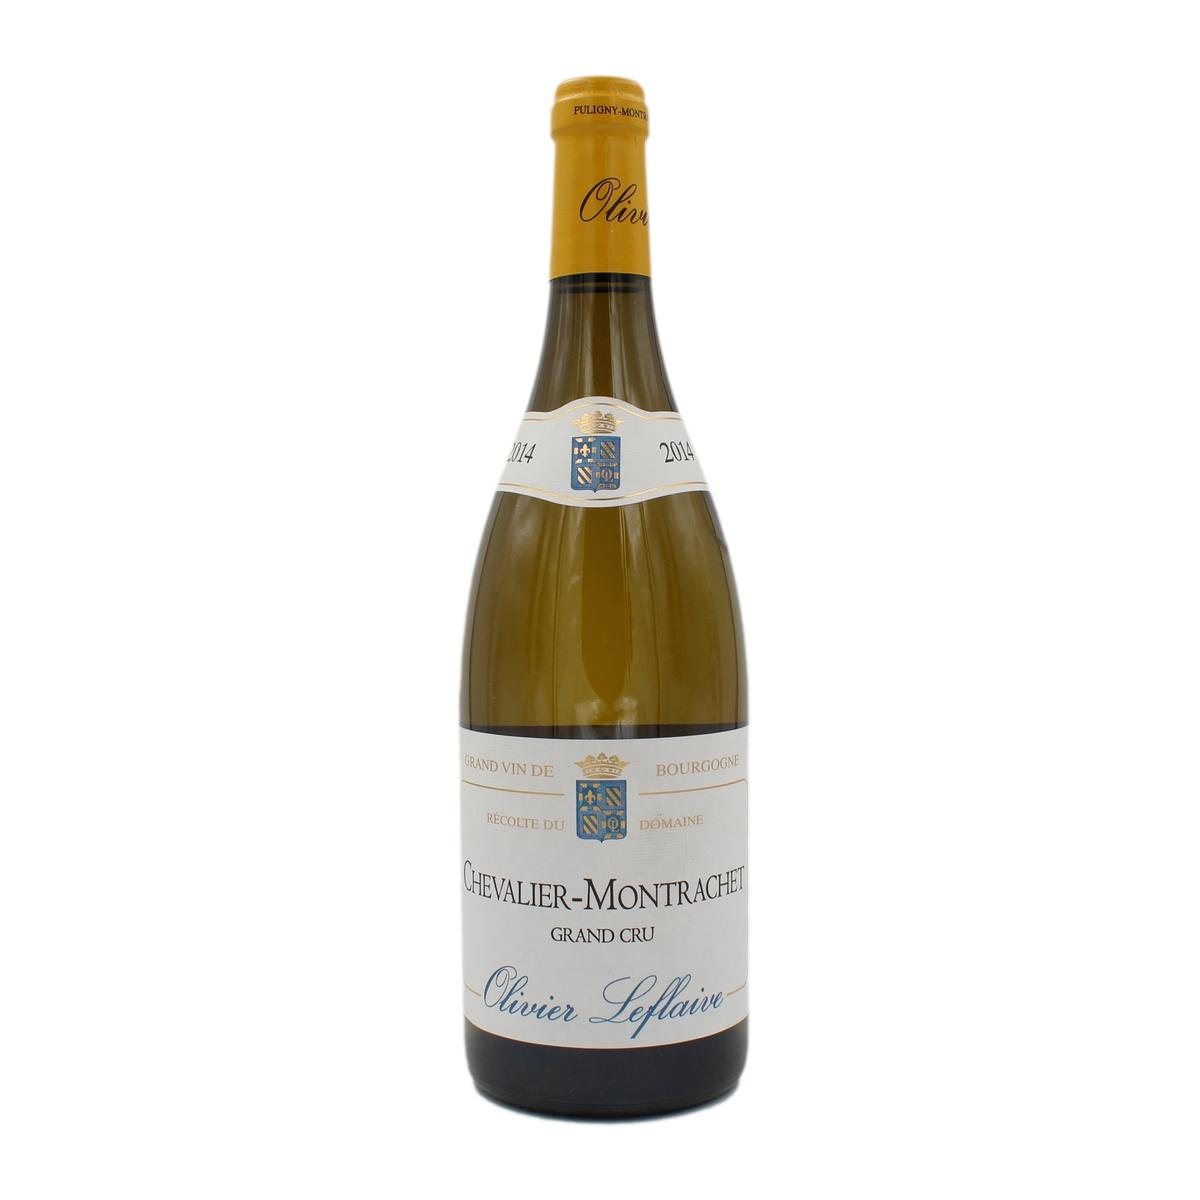 Chevalier-Montrachet Grand Cru 2014 Domaine Olivier Leflaive